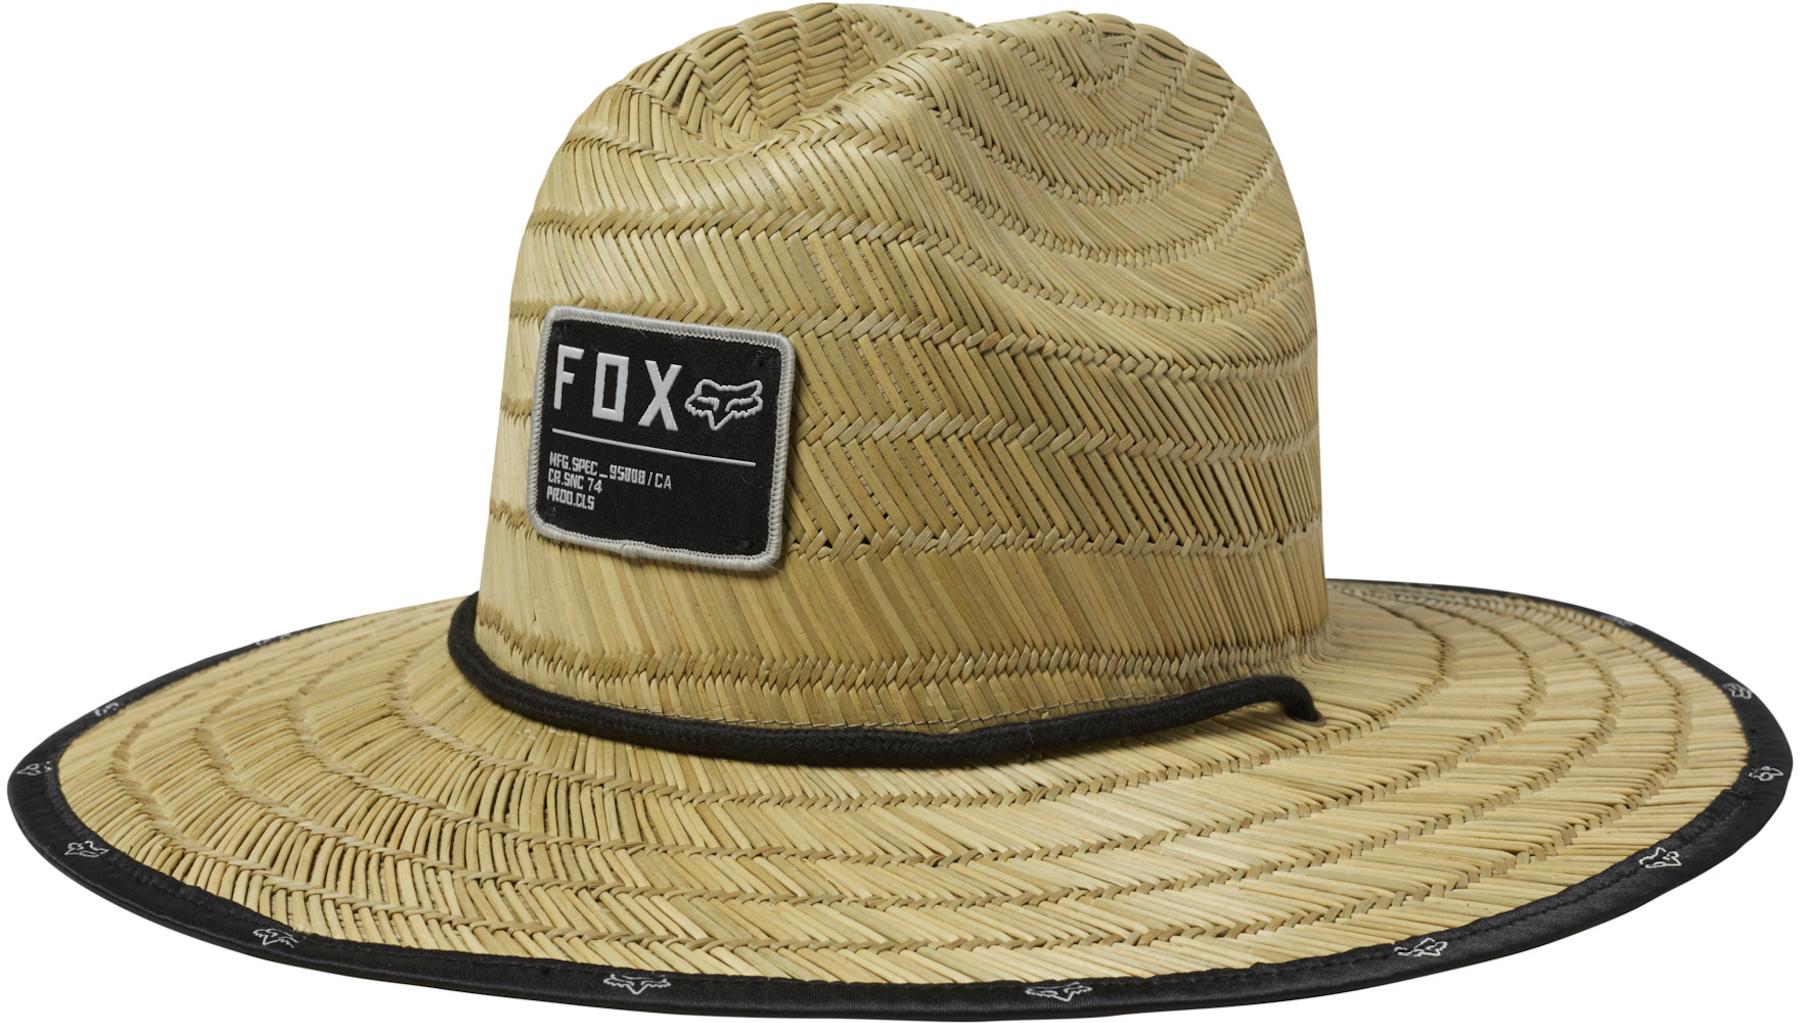 FOX Non Stop Straw Hat - khaki